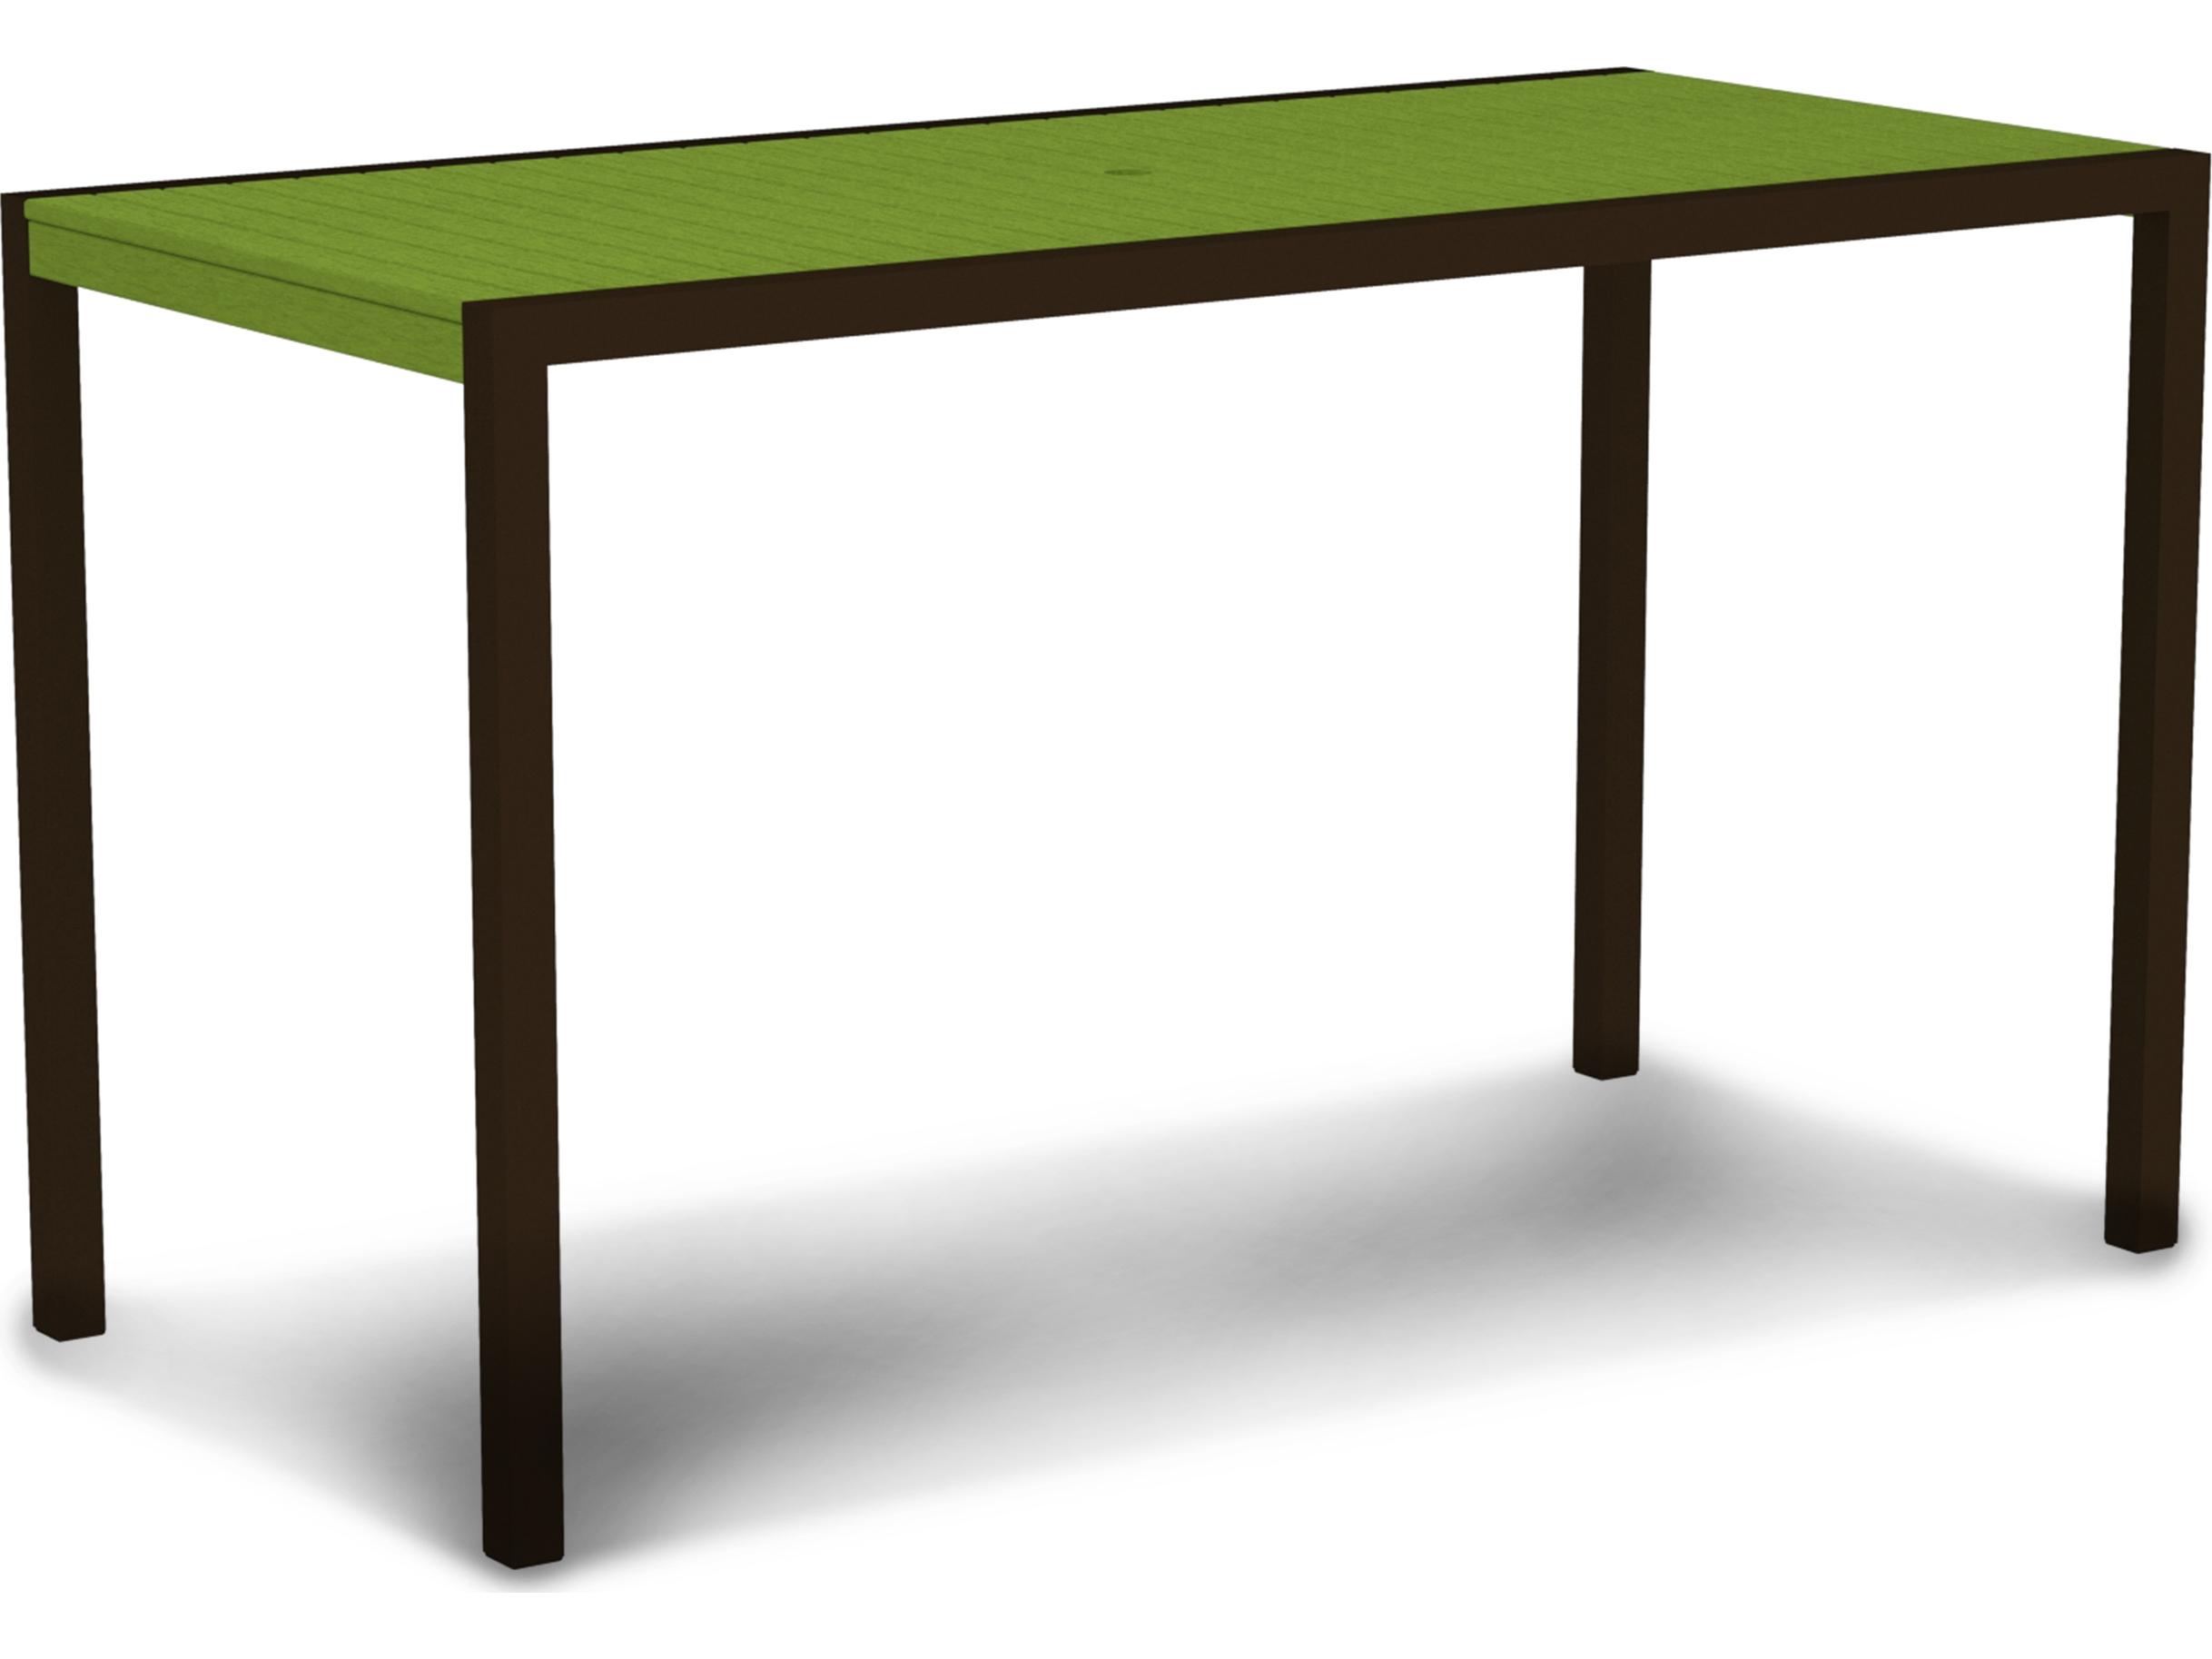 polywood mod aluminum 73 x 36 rectangular bar table 8302. Black Bedroom Furniture Sets. Home Design Ideas